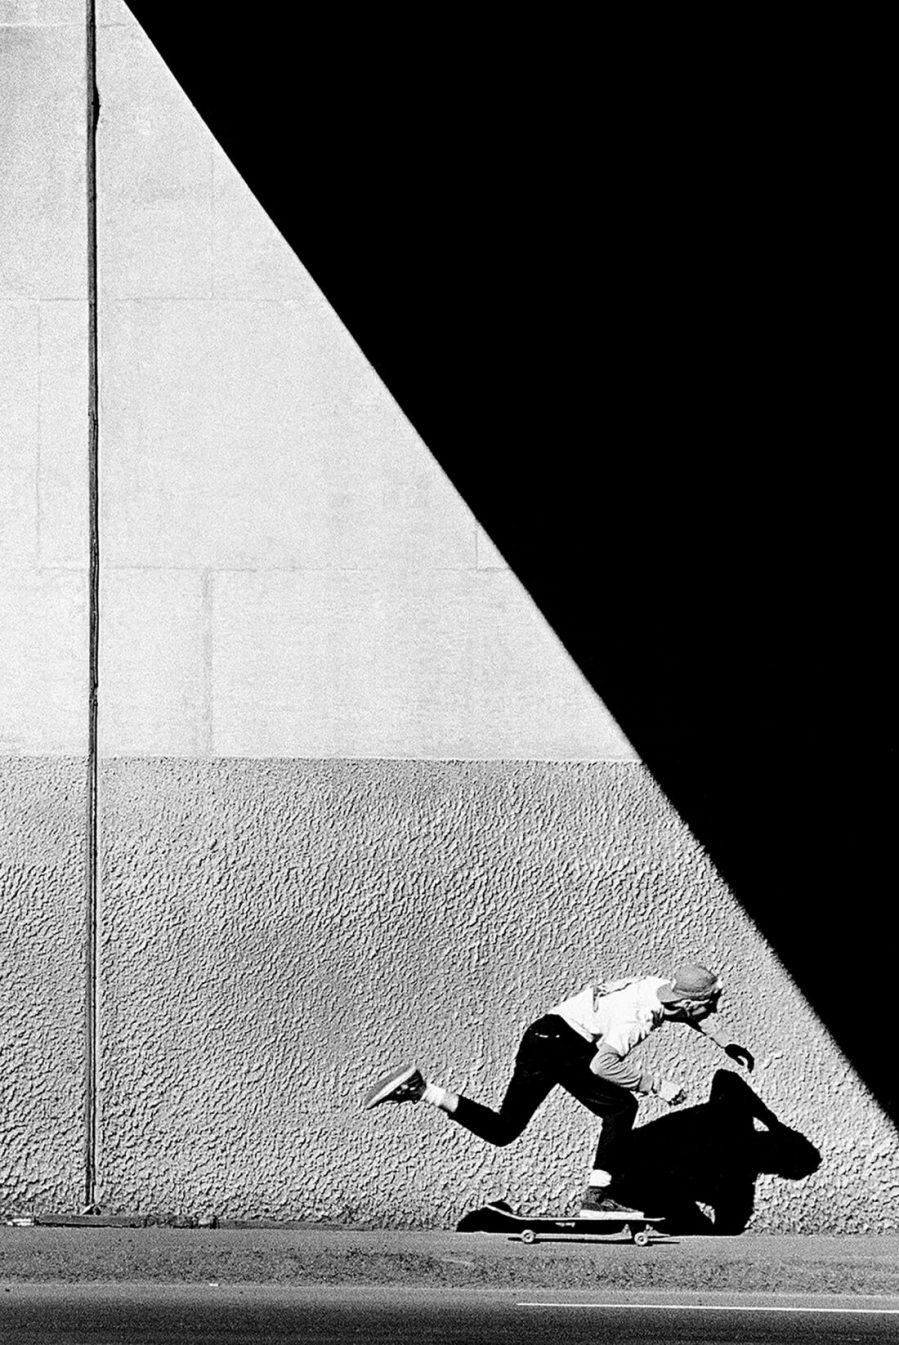 J. Grant Brittain, Todd Swank, Push, 1987